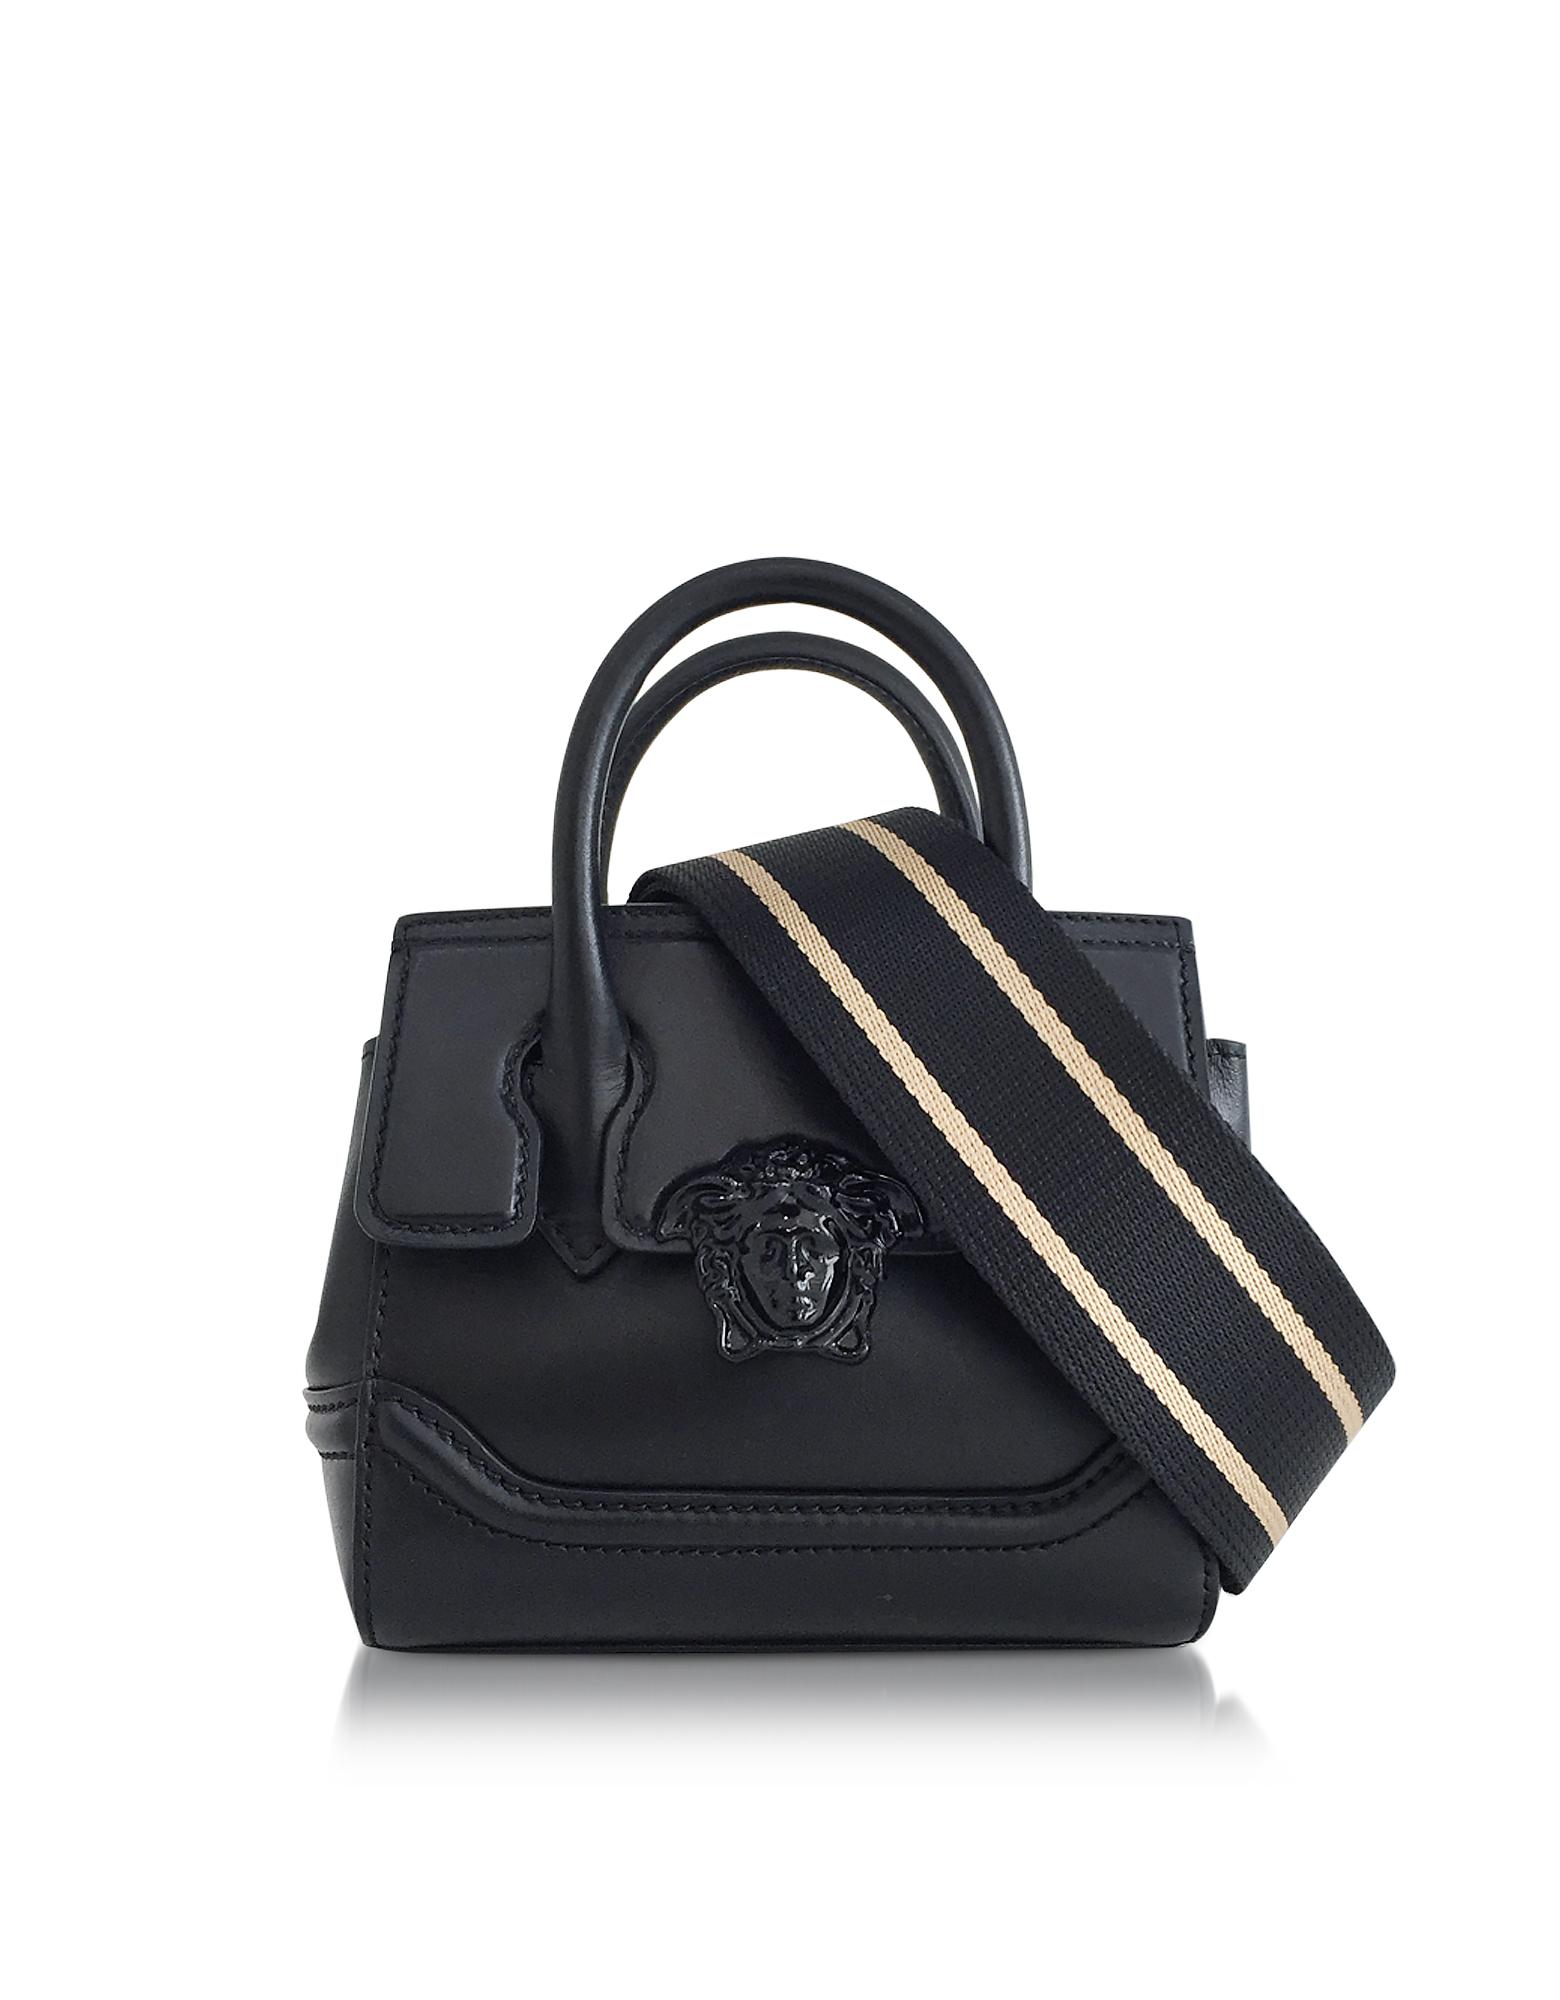 8ebdfd4d8a Versace Palazzo Empire Black Leather Mini Handbag in Black - Lyst